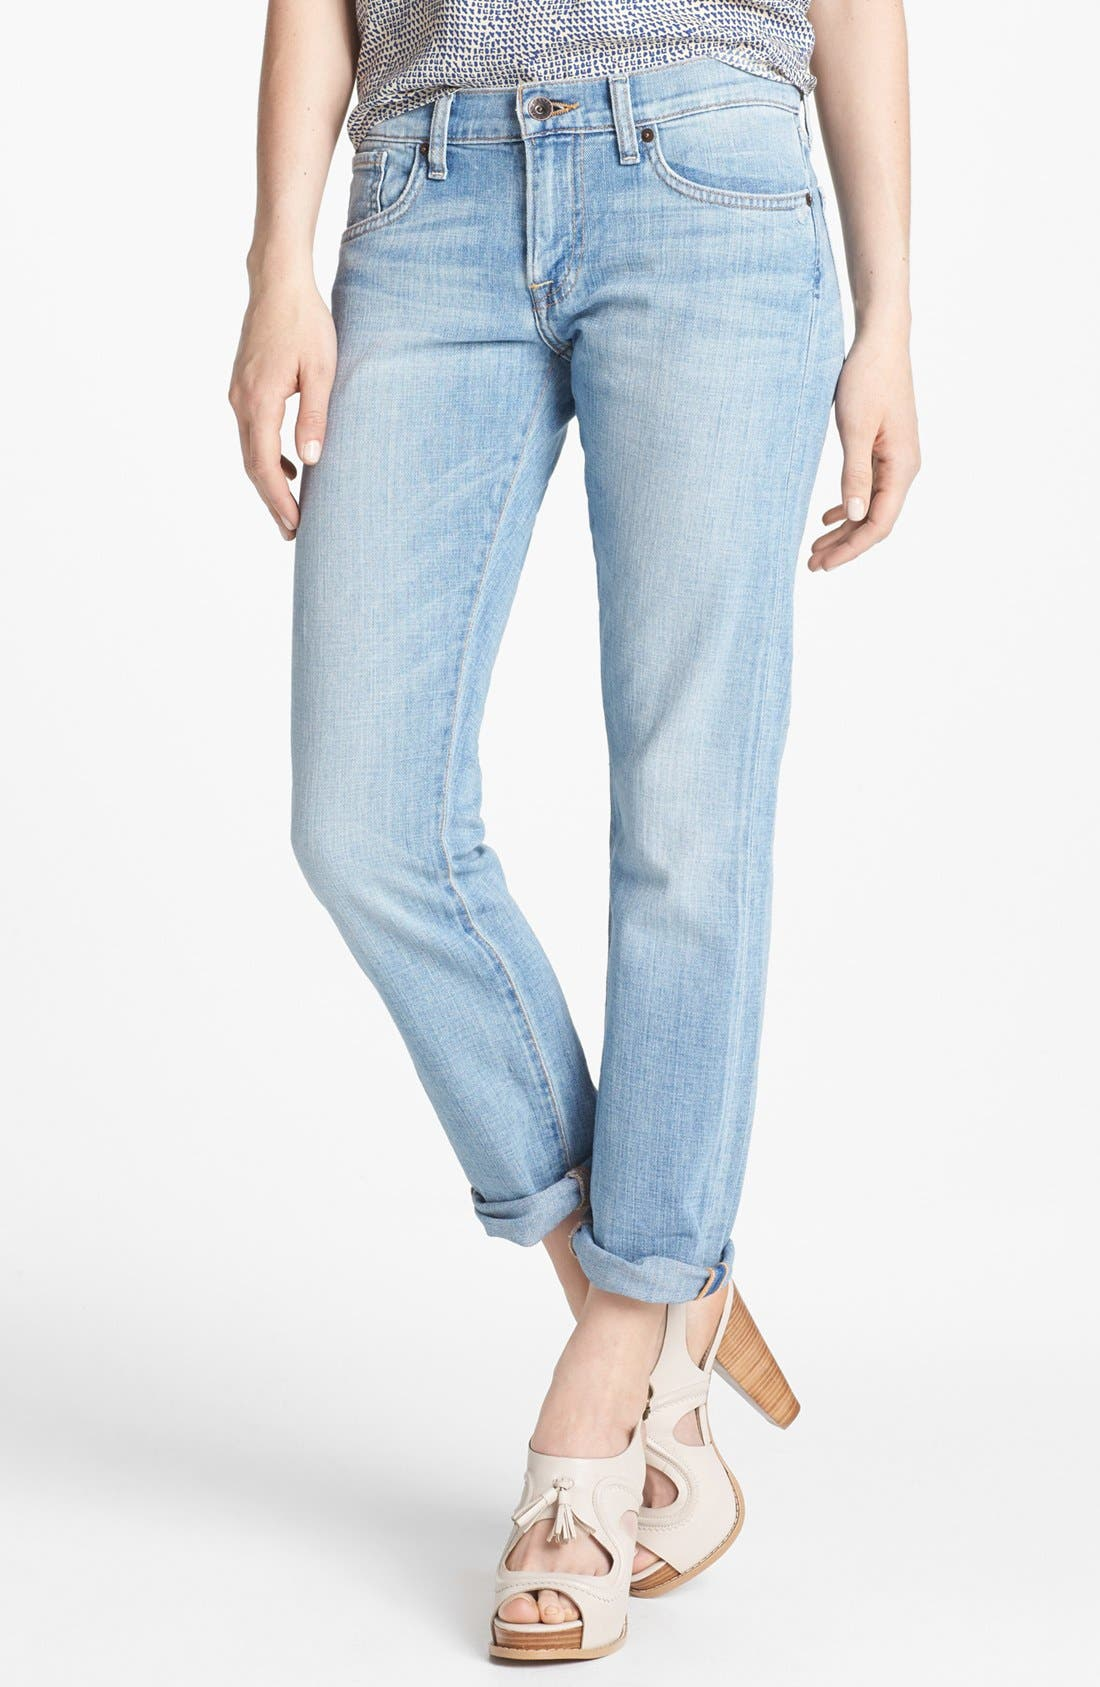 Main Image - Lucky Brand 'Sienna' Tomboy Crop Jeans (La Jolla)